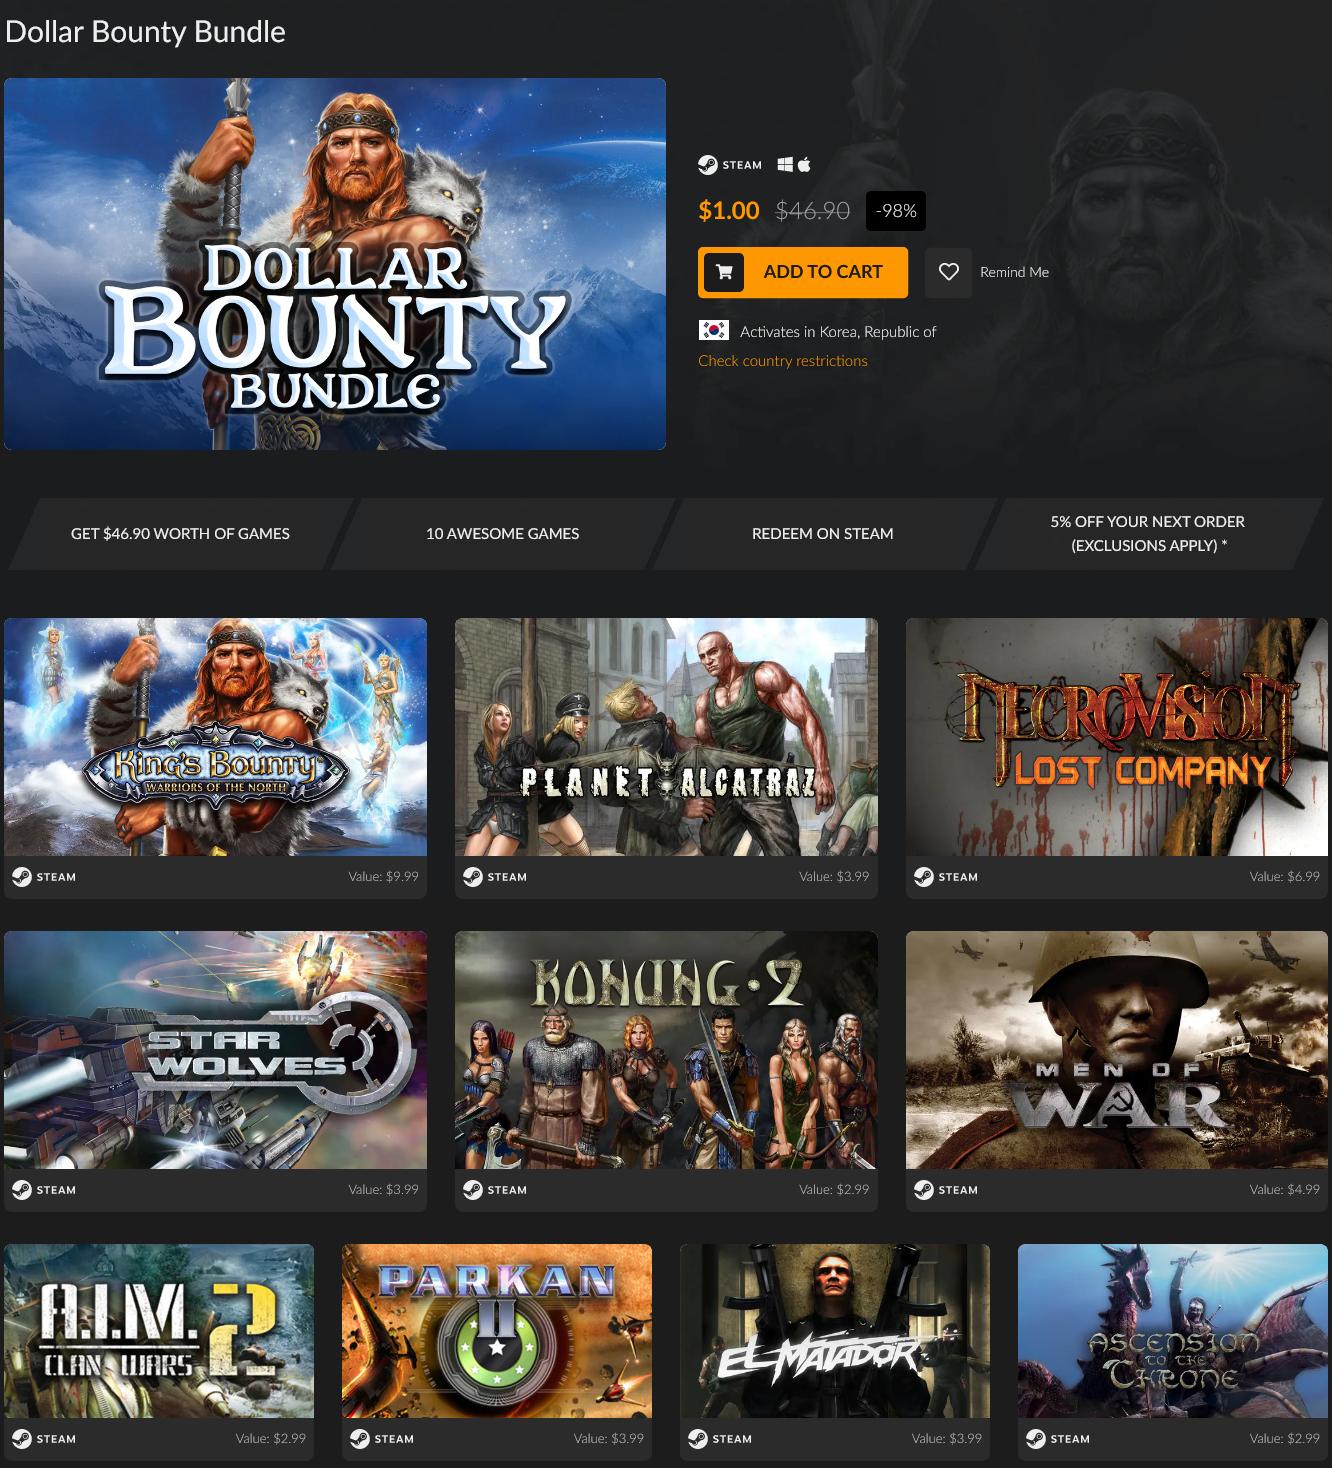 Screenshot 2021-09-24 at 00-16-48 Dollar Bounty Bundle Steam Game Bundle Fanatical.png